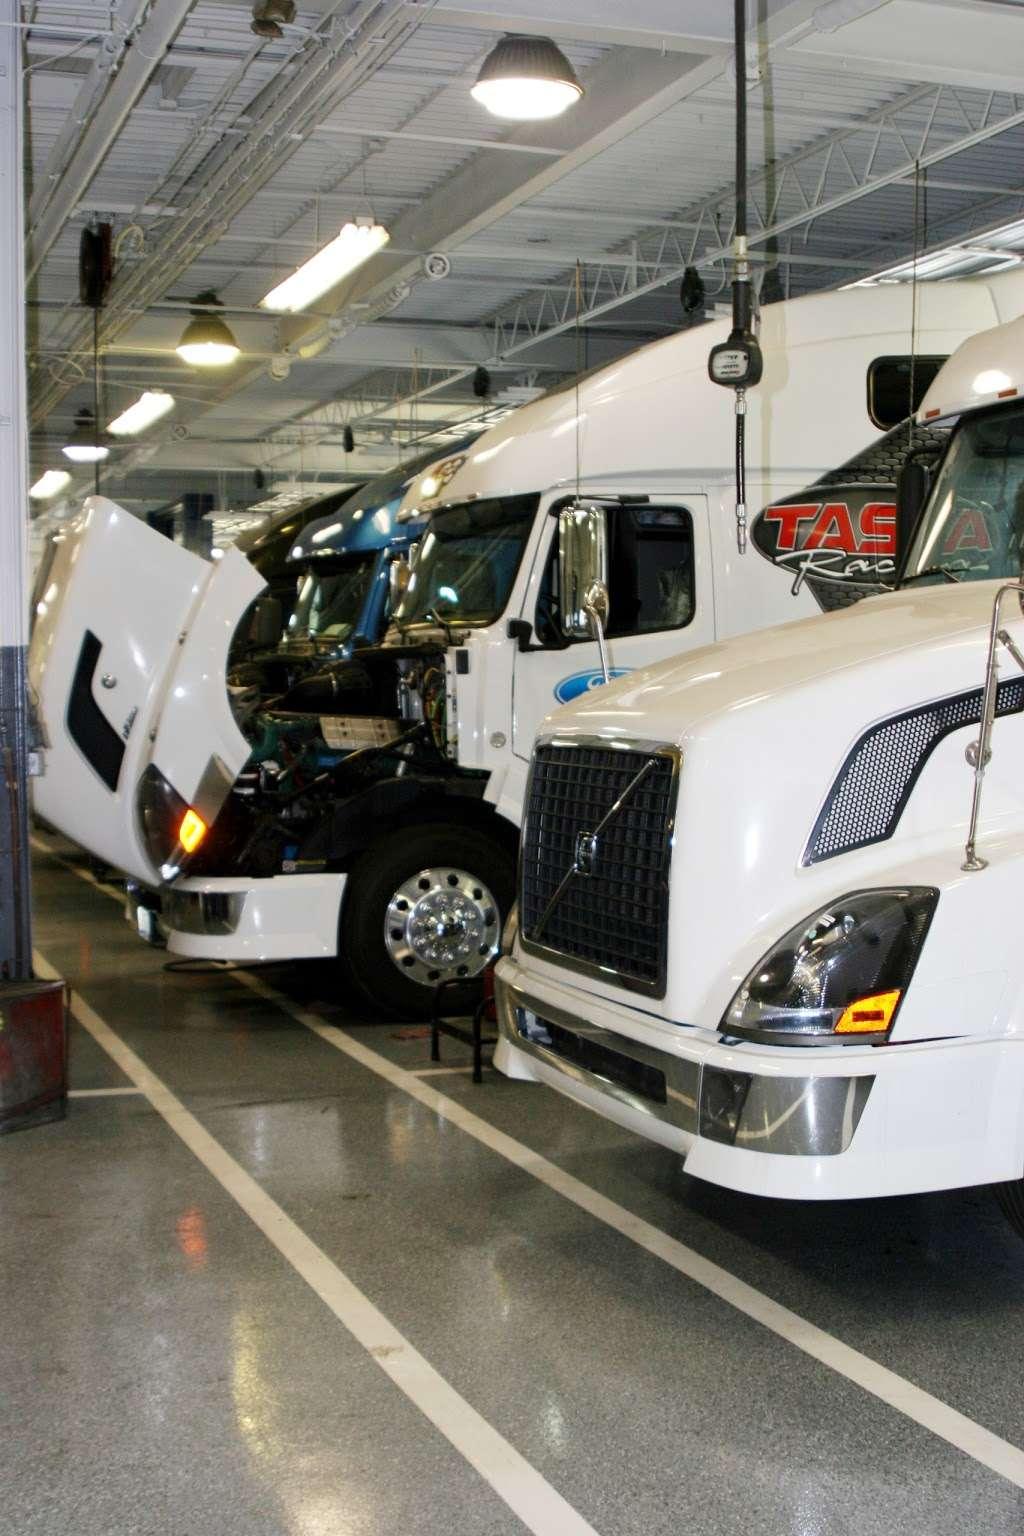 Advantage Truck Center - car repair  | Photo 10 of 10 | Address: 3880 Jeff Adams Dr, Charlotte, NC 28206, USA | Phone: (704) 597-0551